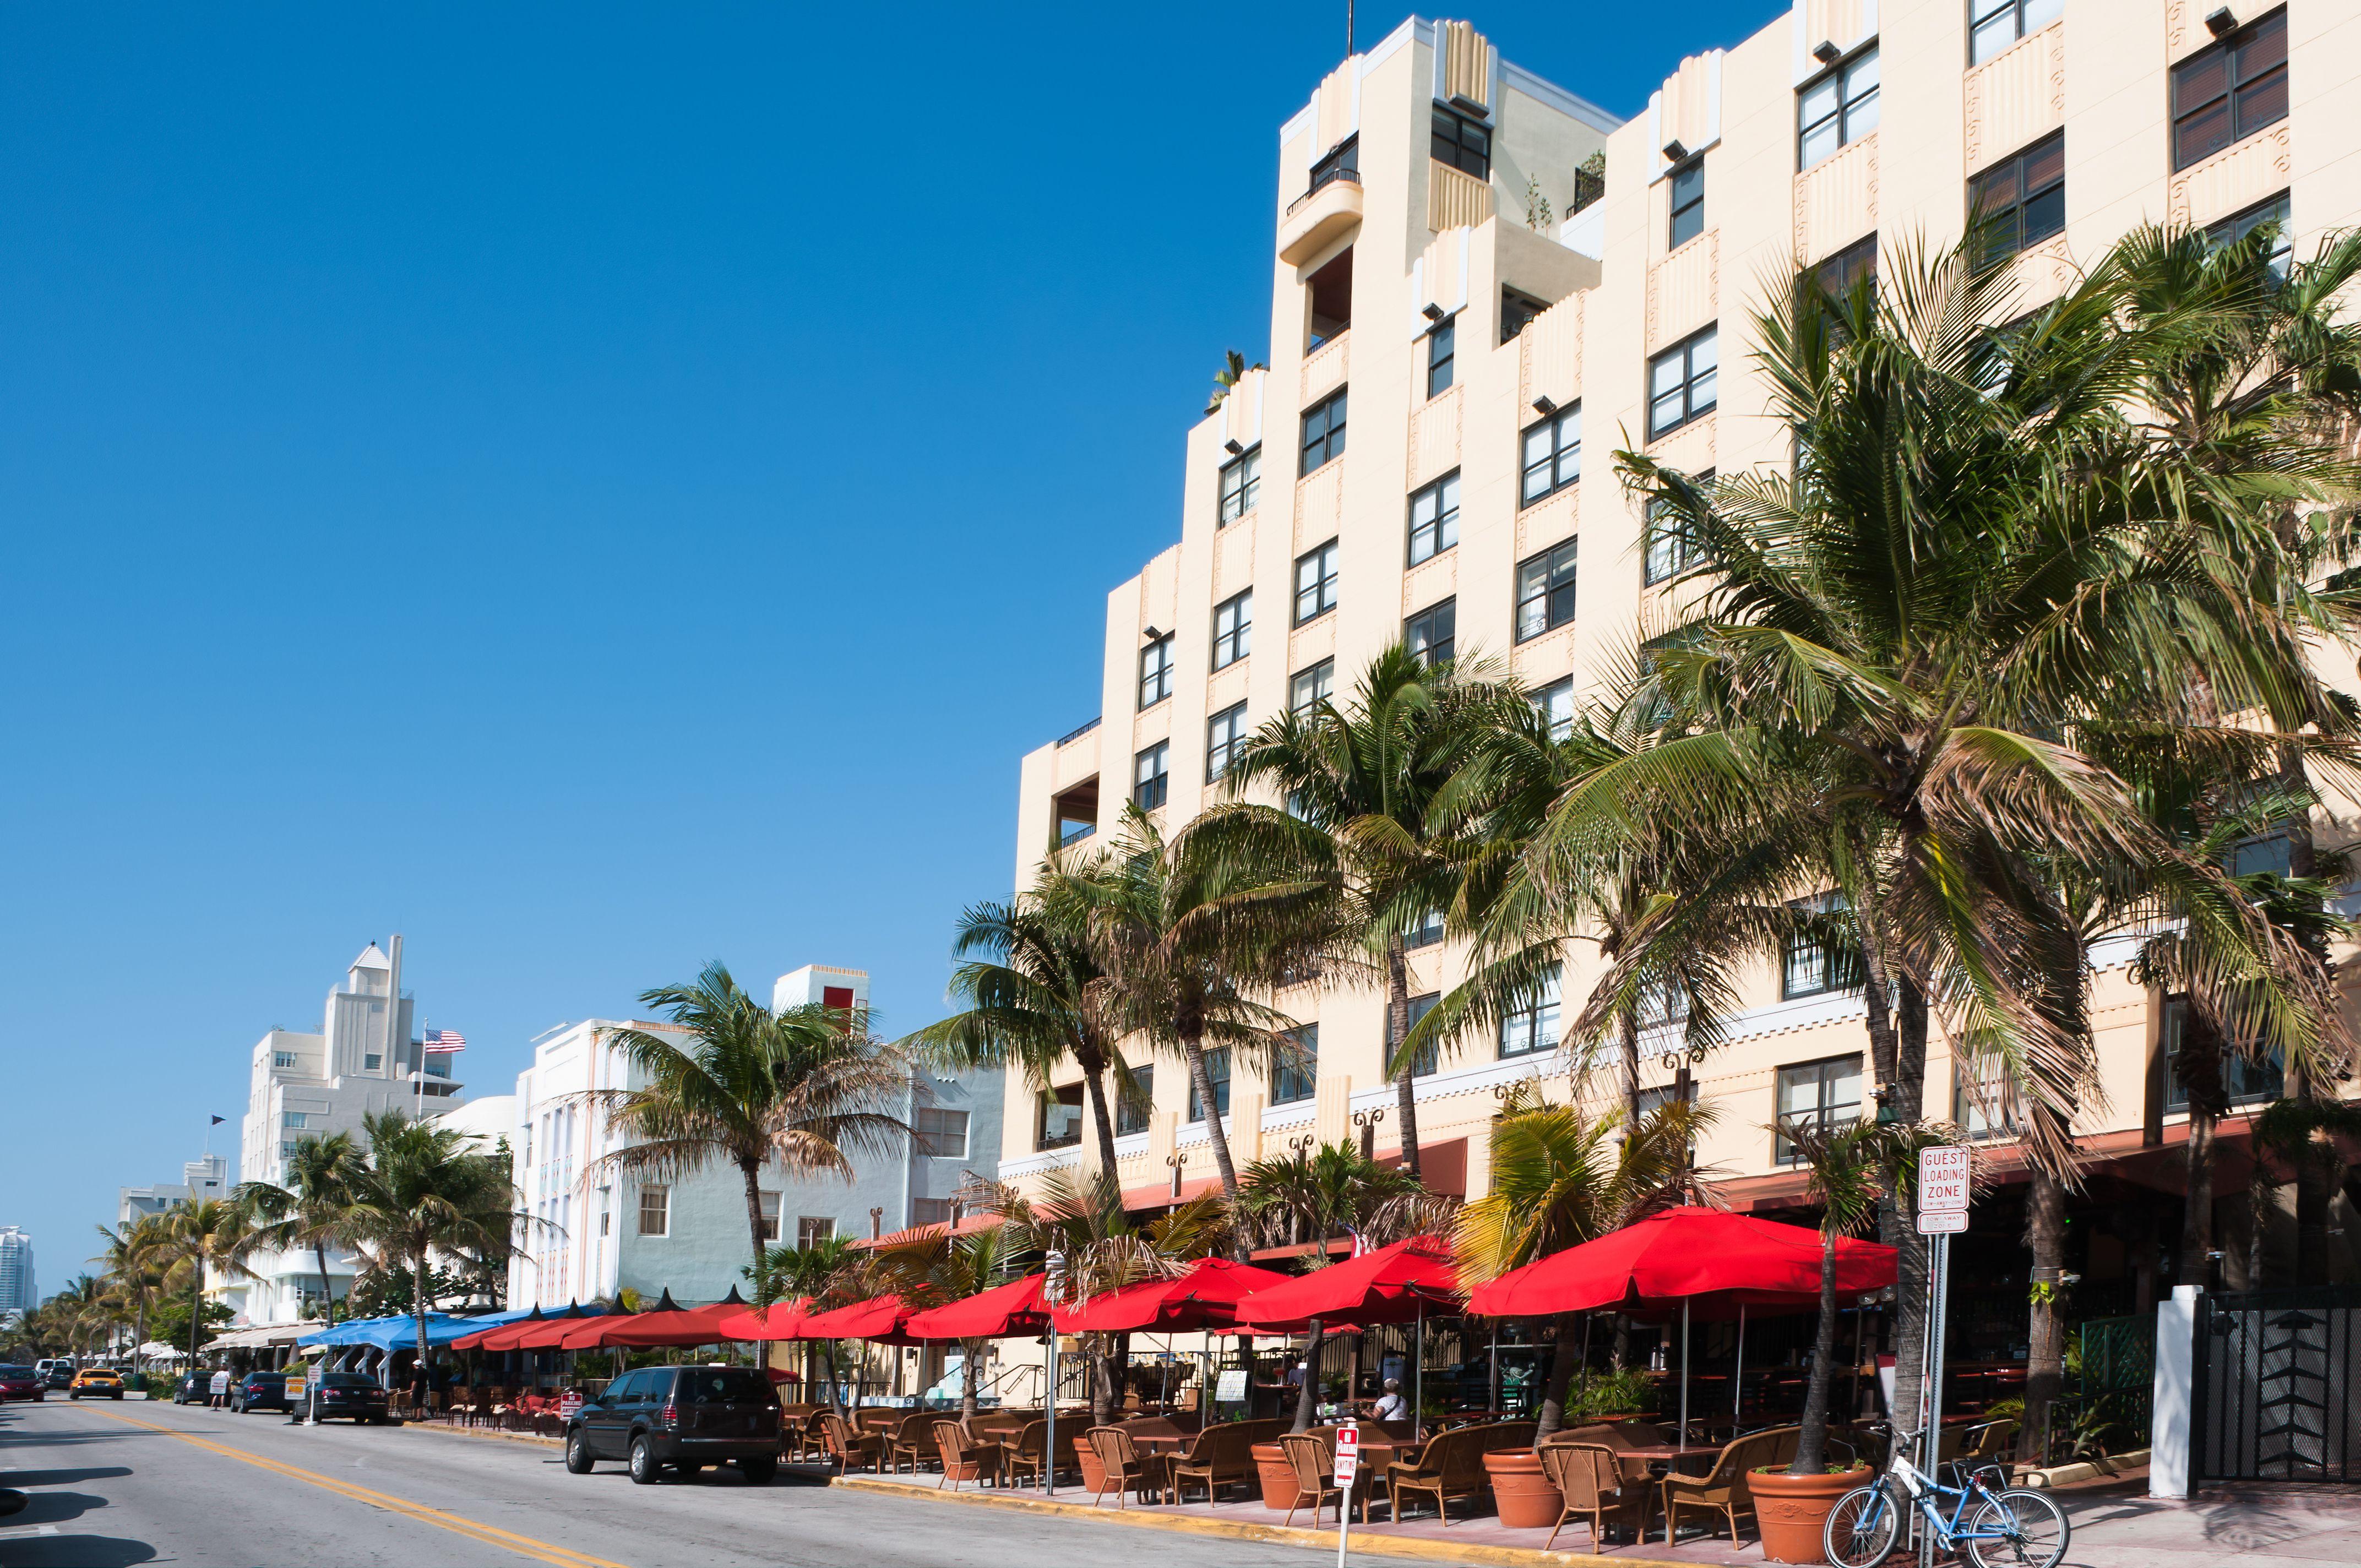 Cafe in Miami, Florida